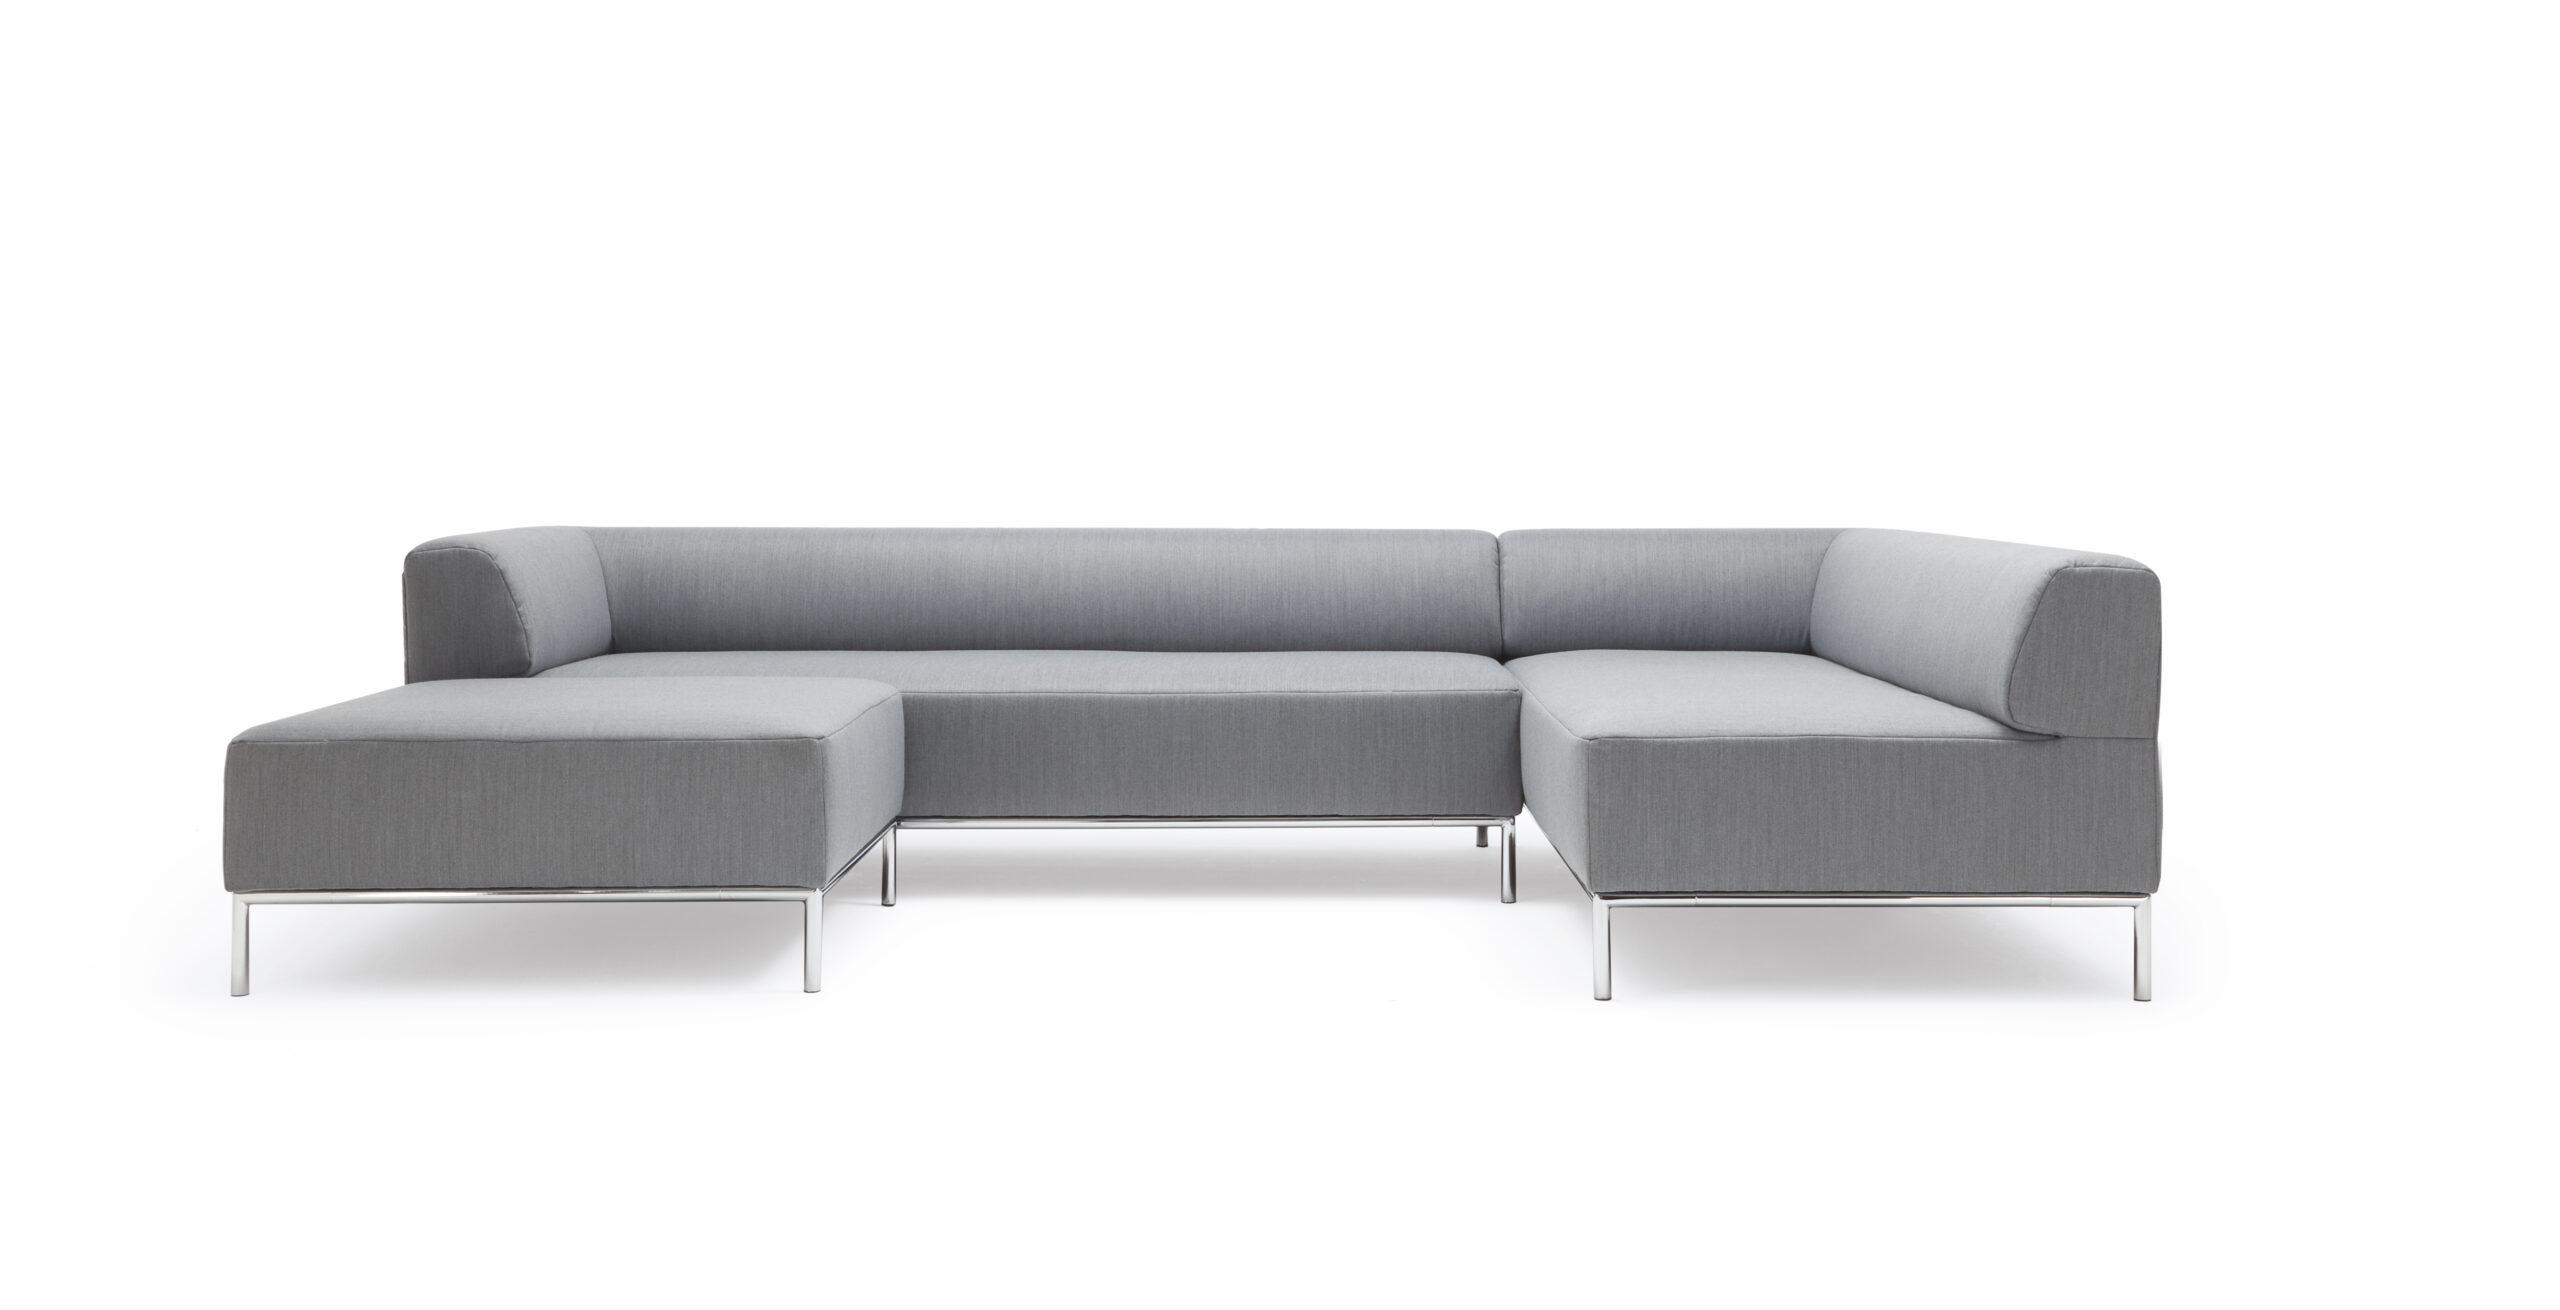 Full Size of Couch Freistil Rolf Benz Sofa 185 Preis 141 187 134 175 Lounge Outletcity Metzingen Store Echtleder 2er Grau Muuto Big Kaufen Delife Mit Bettkasten Boxen Sofa Freistil Sofa